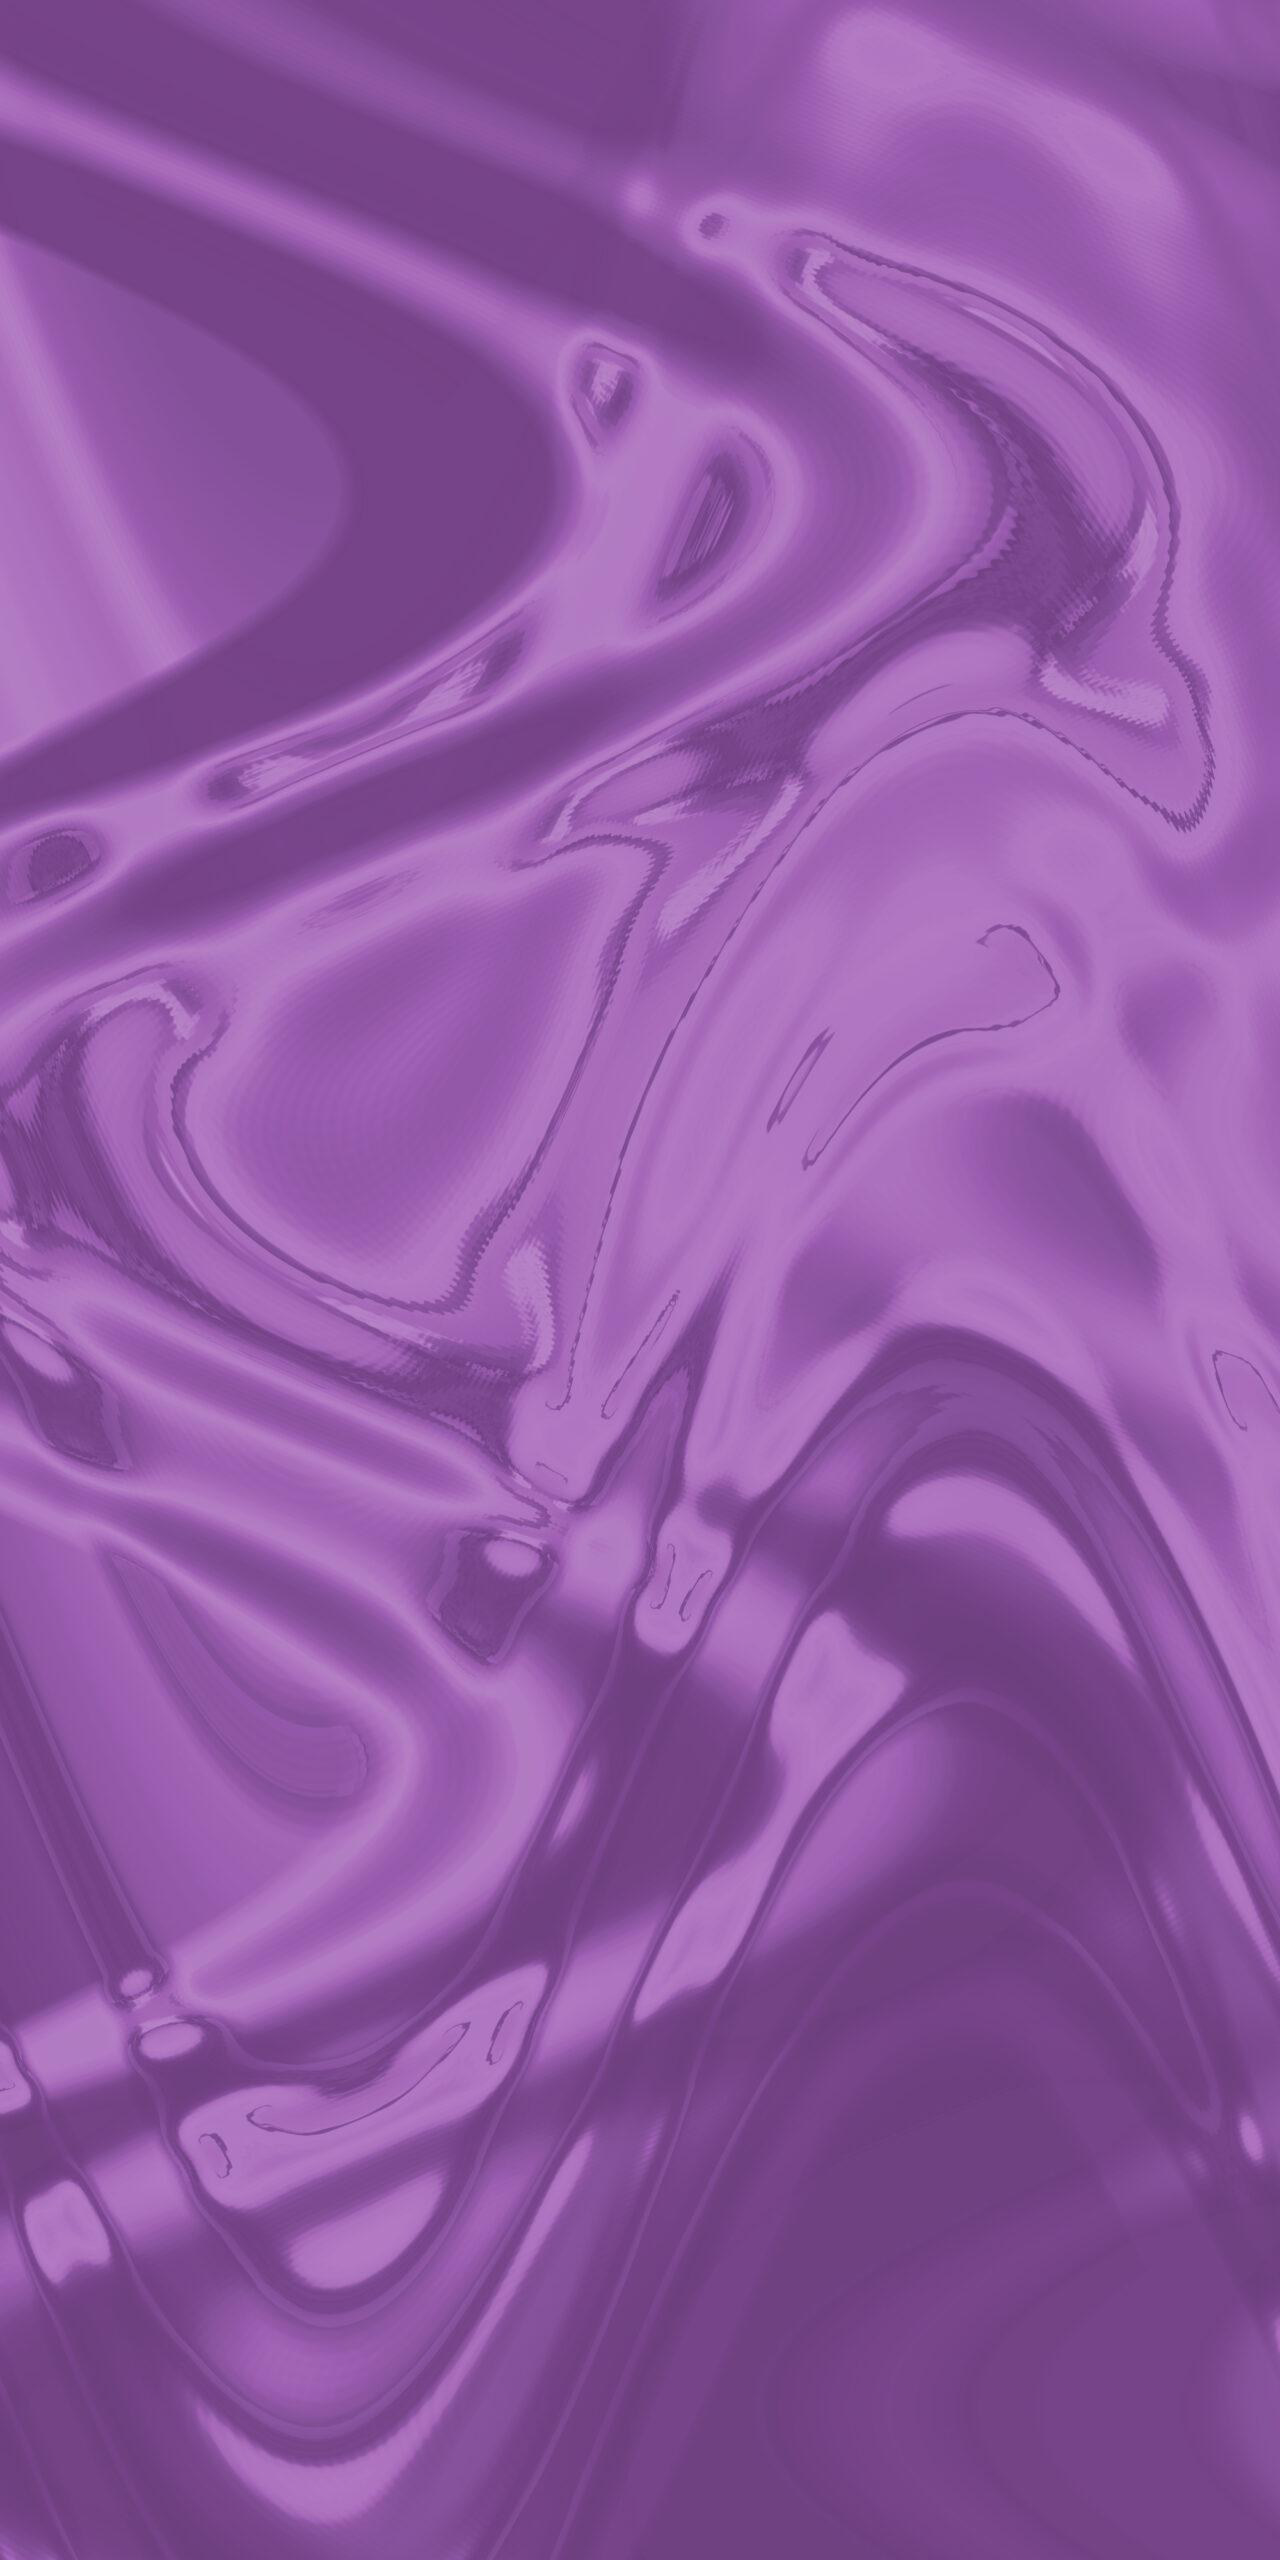 liquid metal purple background wallpaper